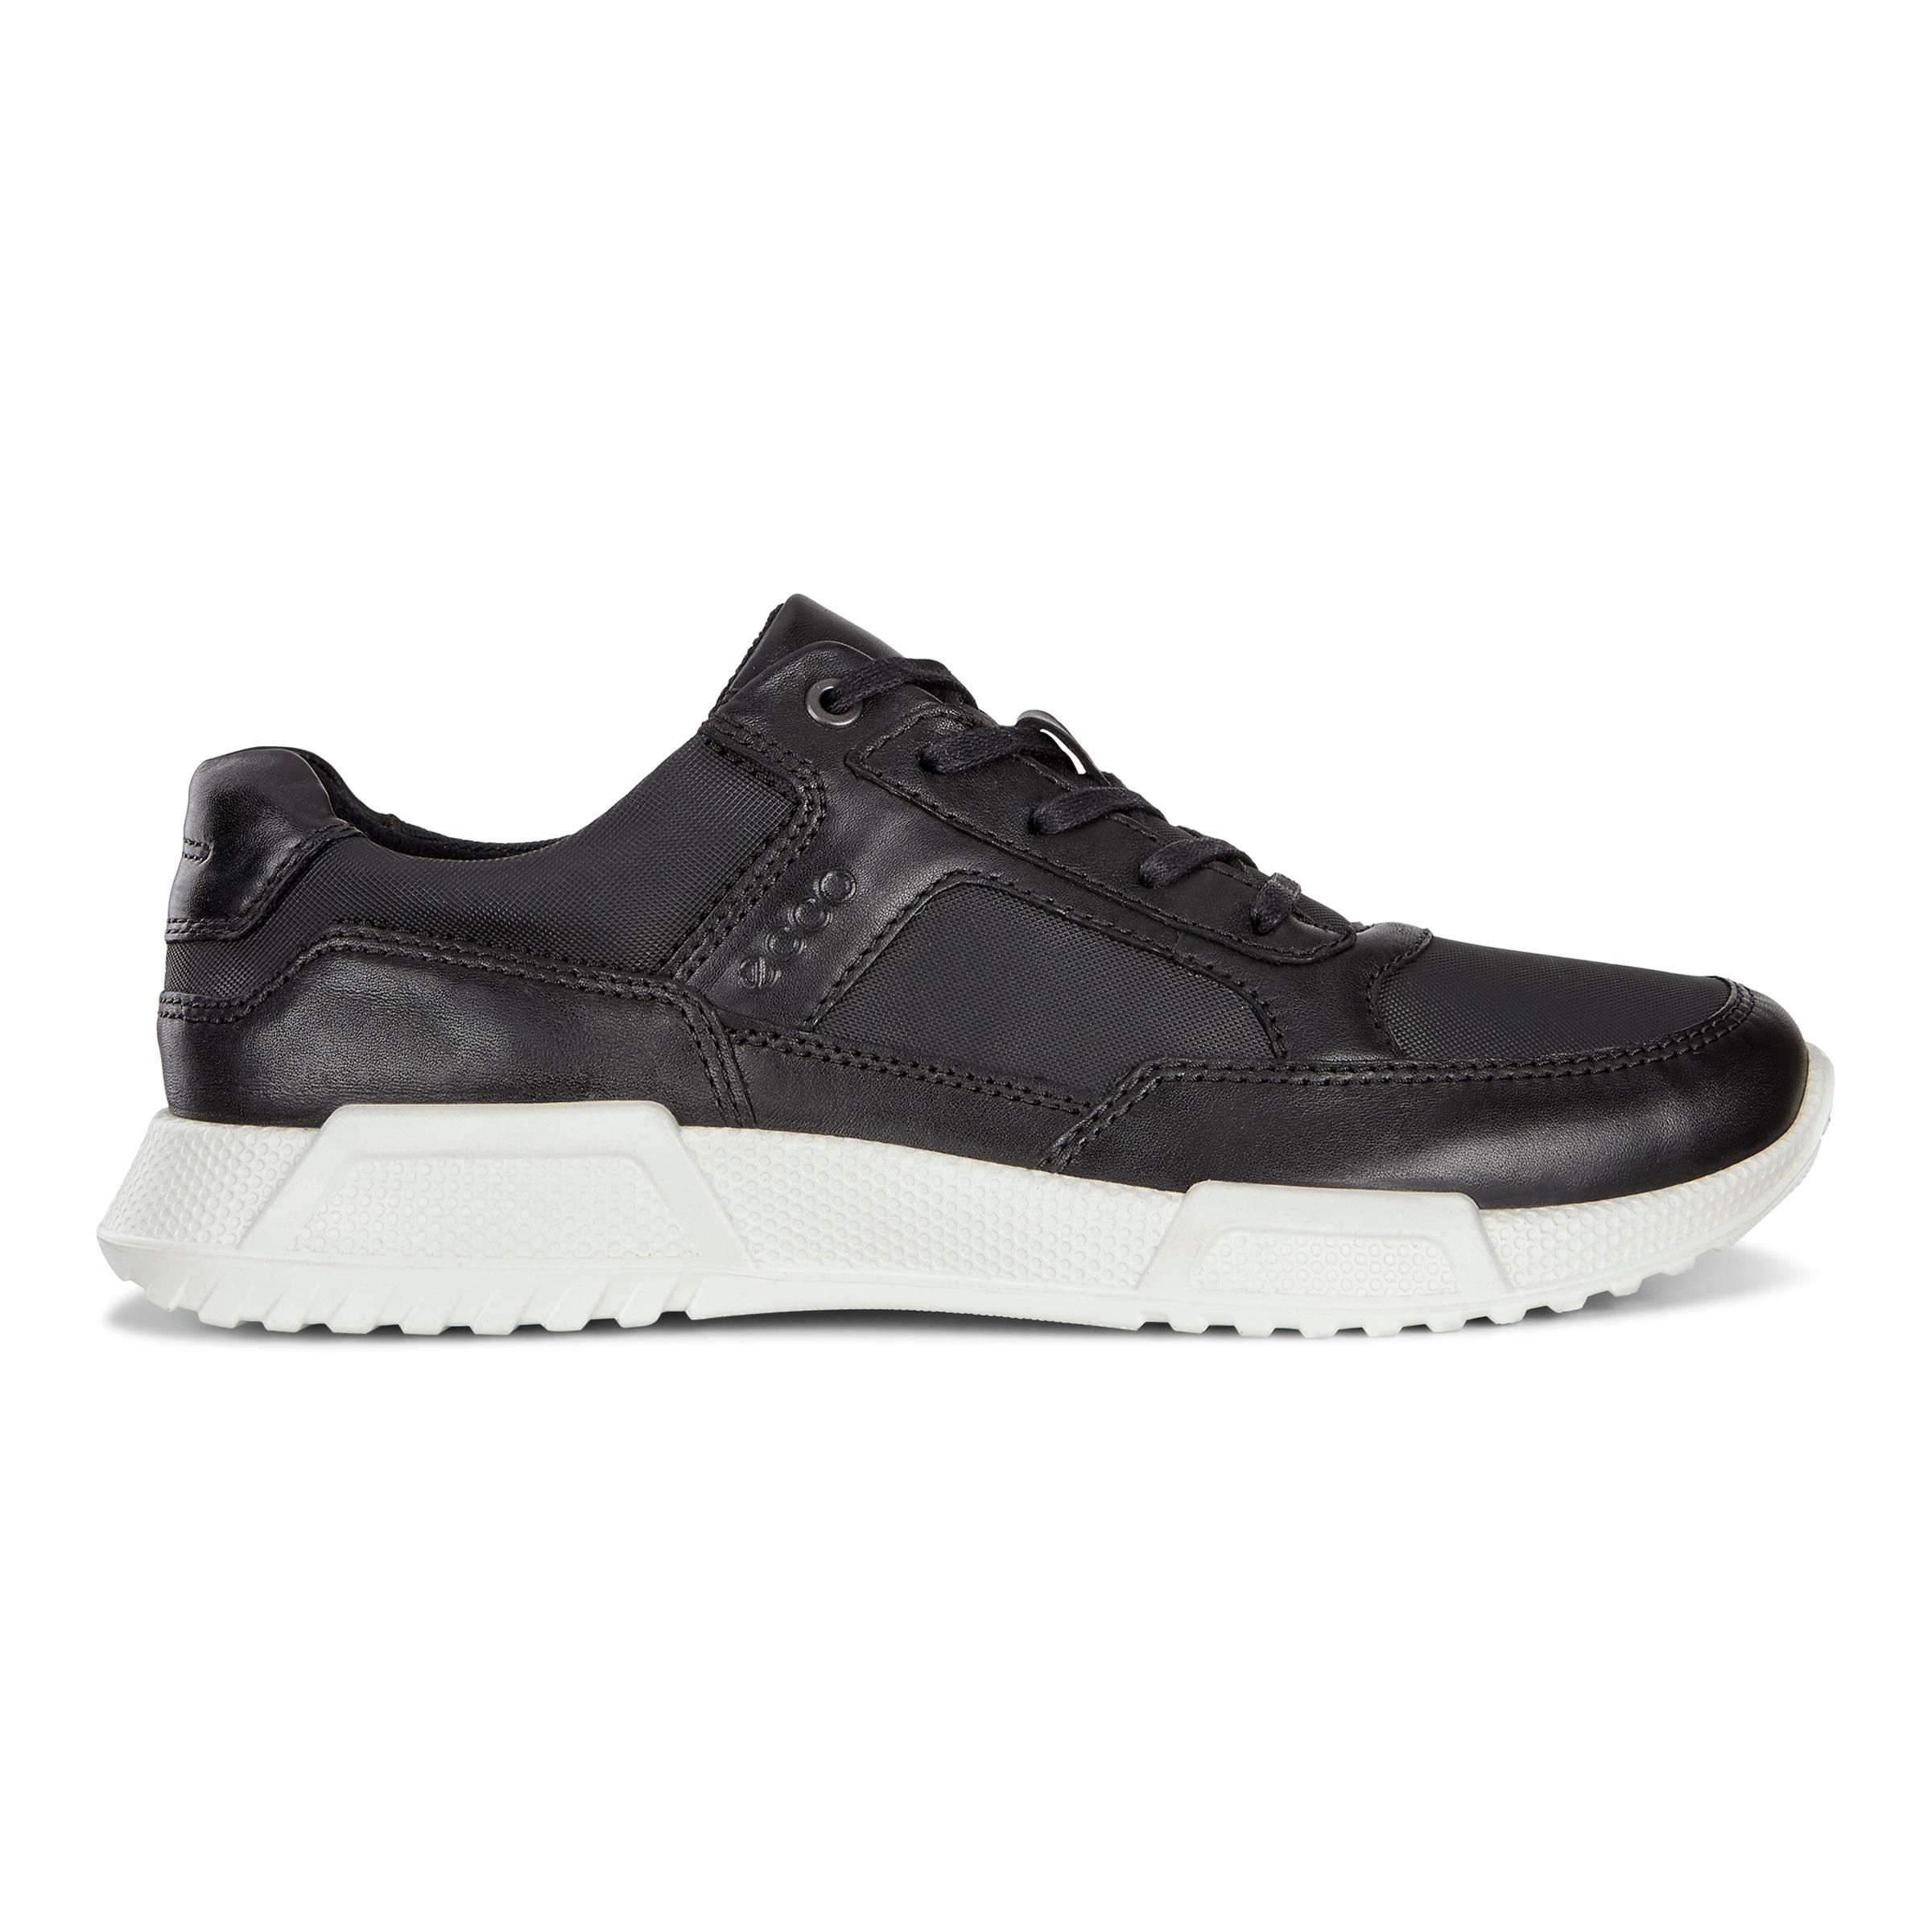 ECCO Luca Sneakers Size 8-8.5 Black